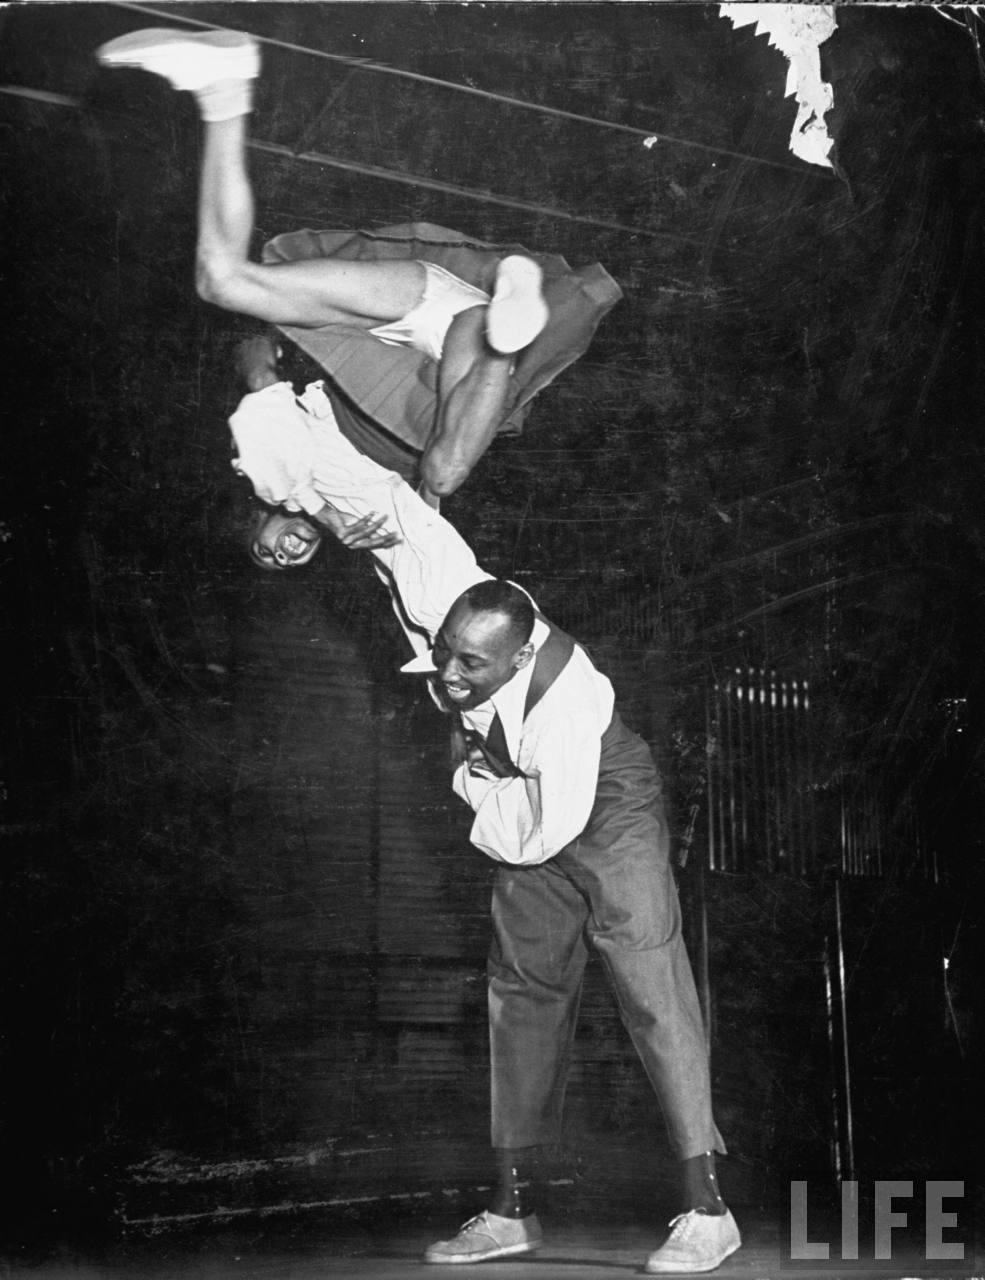 Frankie Manning 與 Ann Johnson, 1941 年LIFE 雜誌( via   Around the Back Around the World )